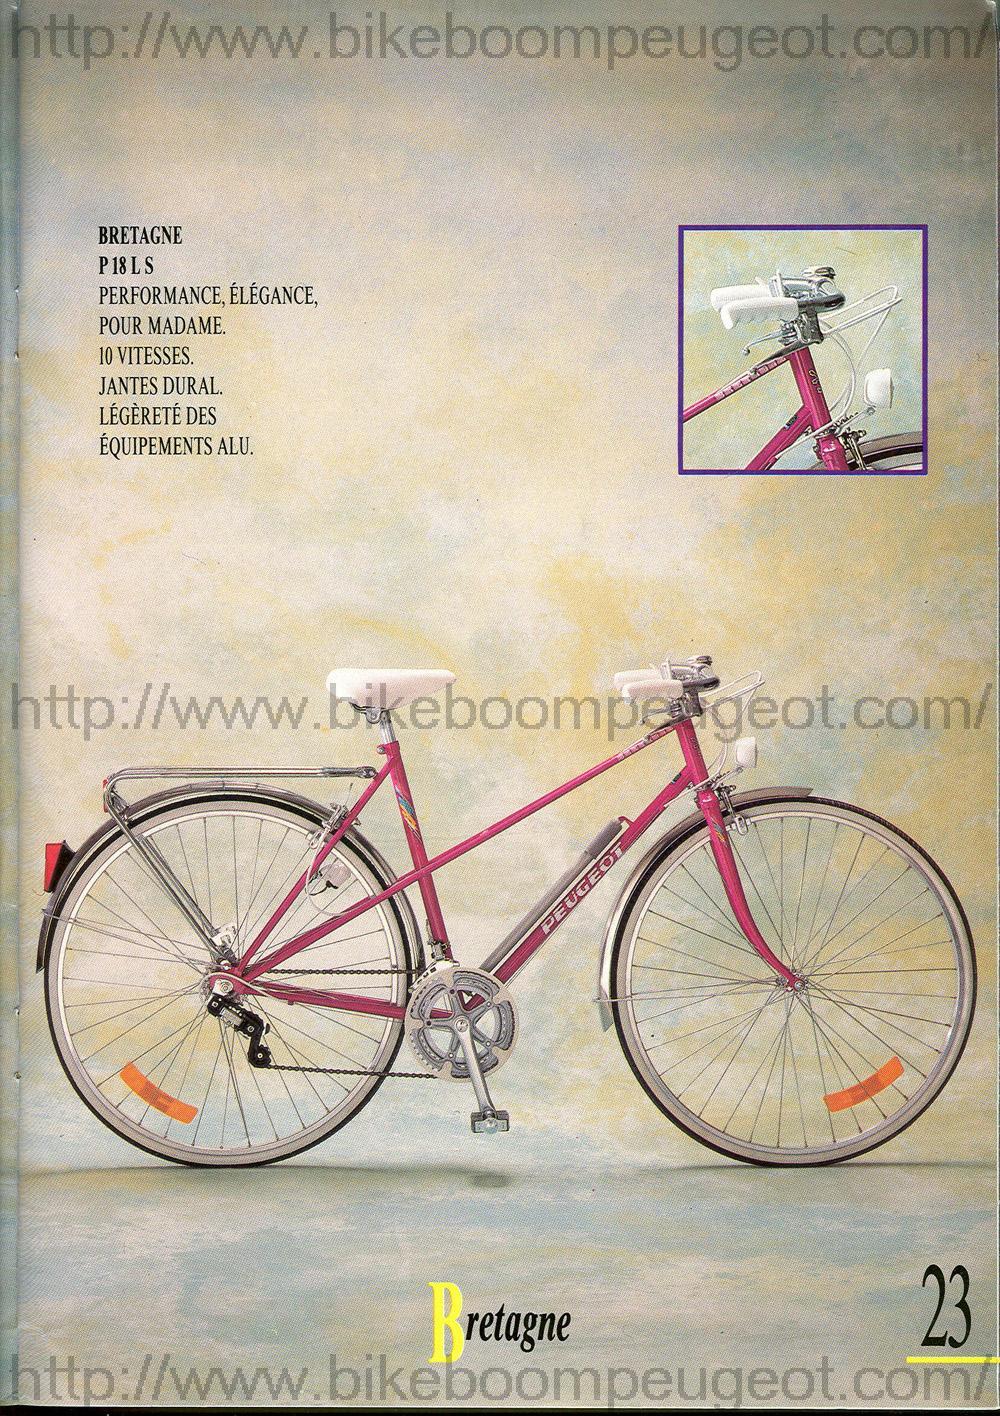 Peugeot Bretagne Rose Metallise HLE P18LS  (custom) Peugeot_1989_France_Brochure_Bretagne_BikeBoomPeugeot